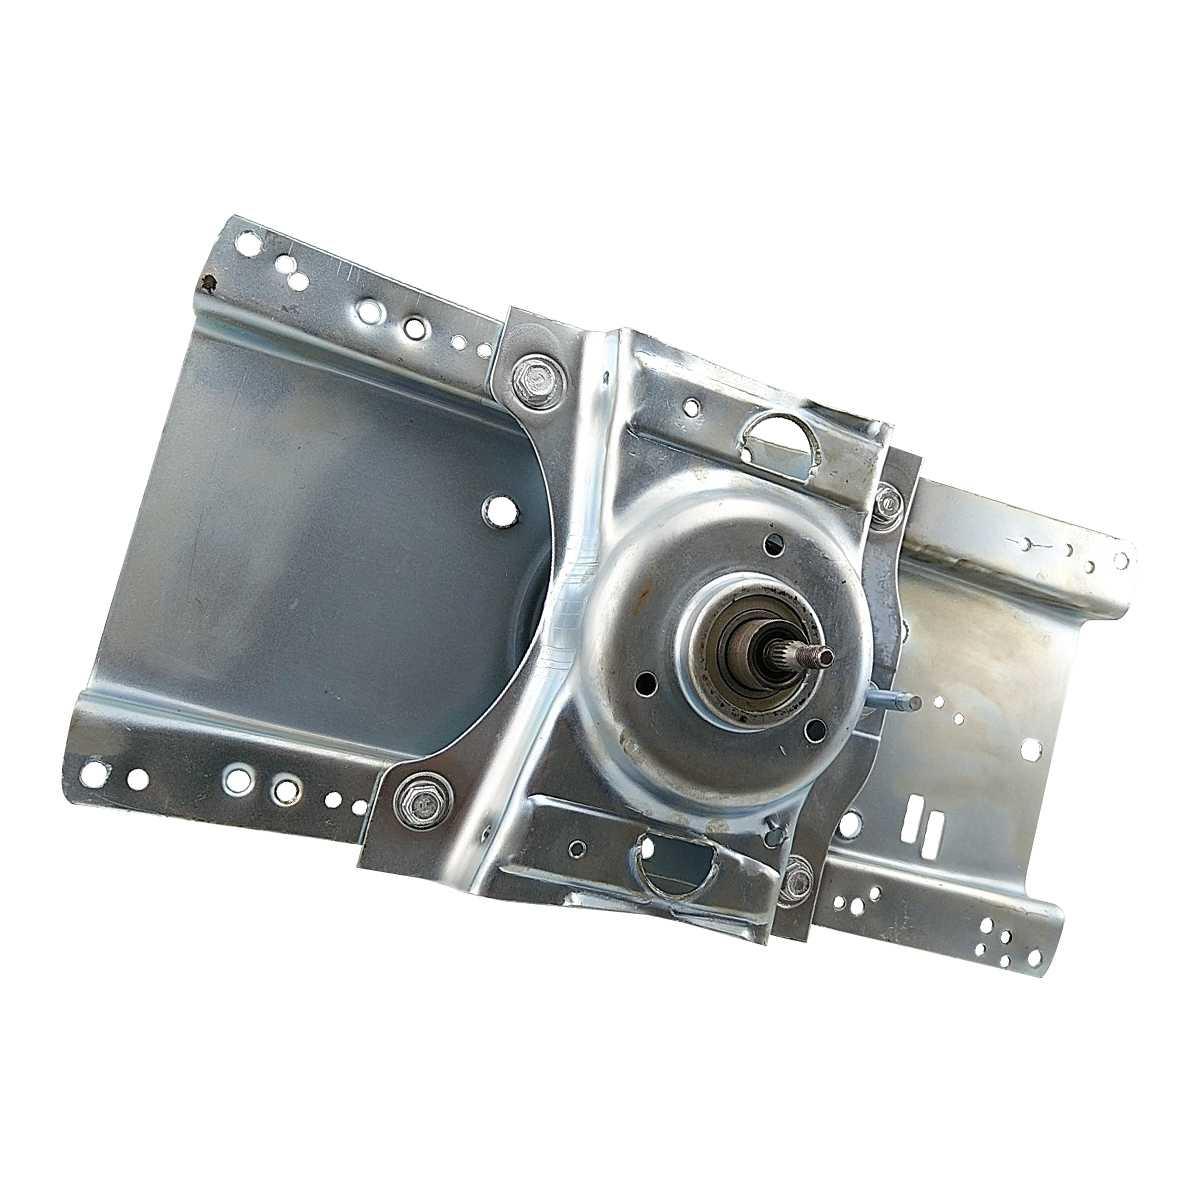 Kit mecanismo cambio da lavadora Electrolux recondicionado